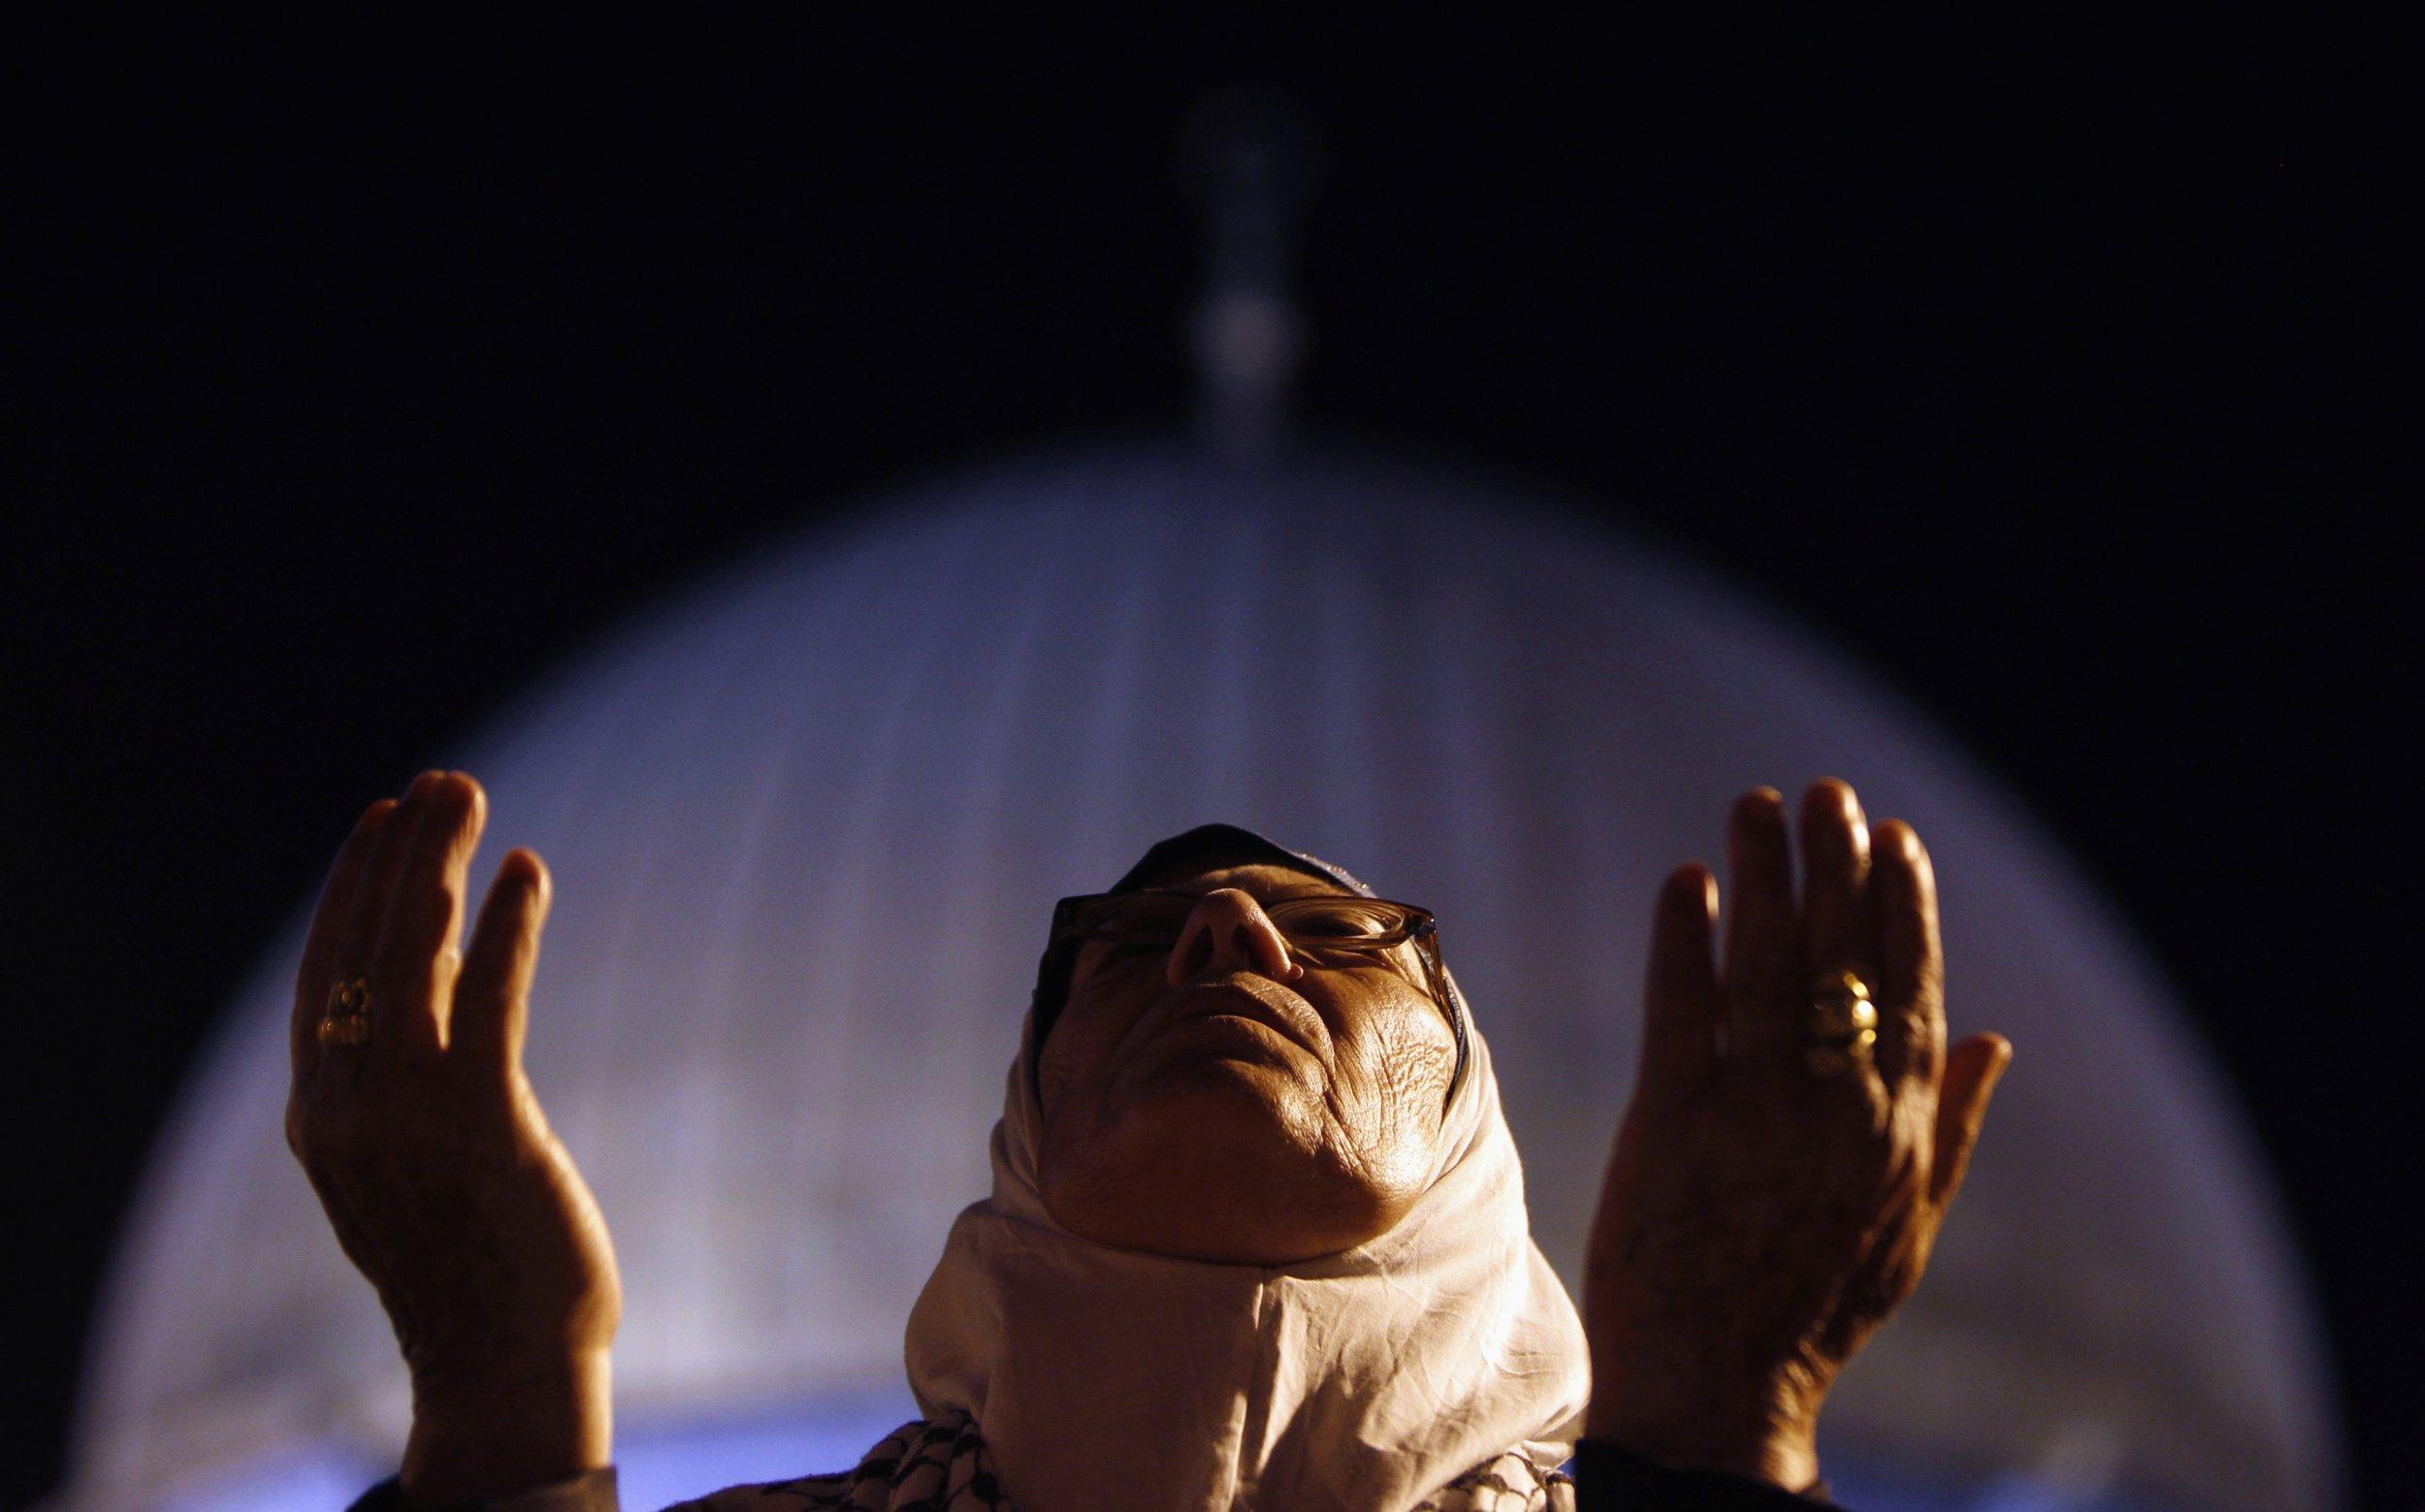 0604_jerusalem_mosque